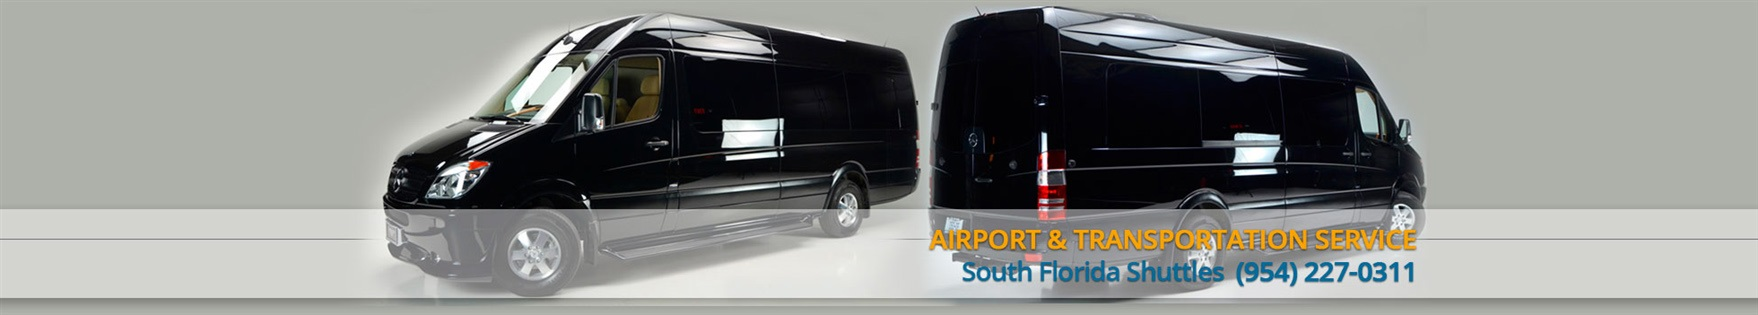 Fort Lauderdale airport shuttle & Seaport Shuttle service